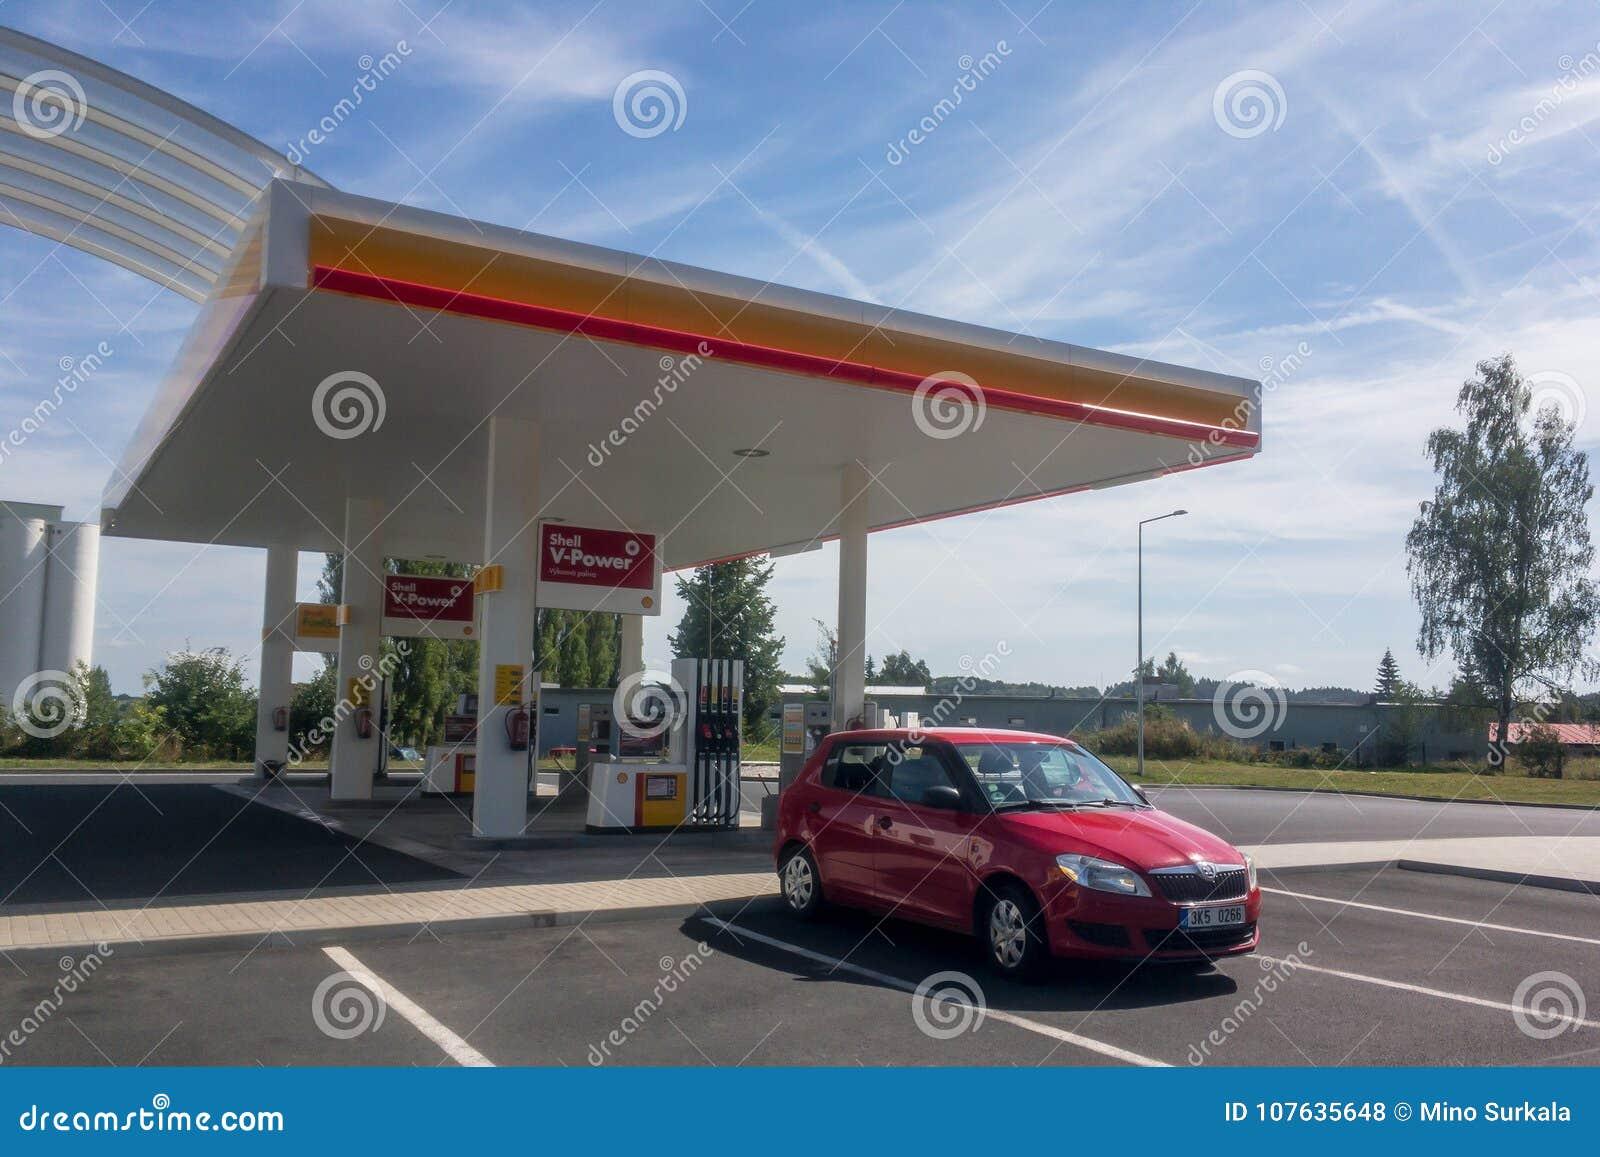 Red Skoda Fabia car at Shell gas station